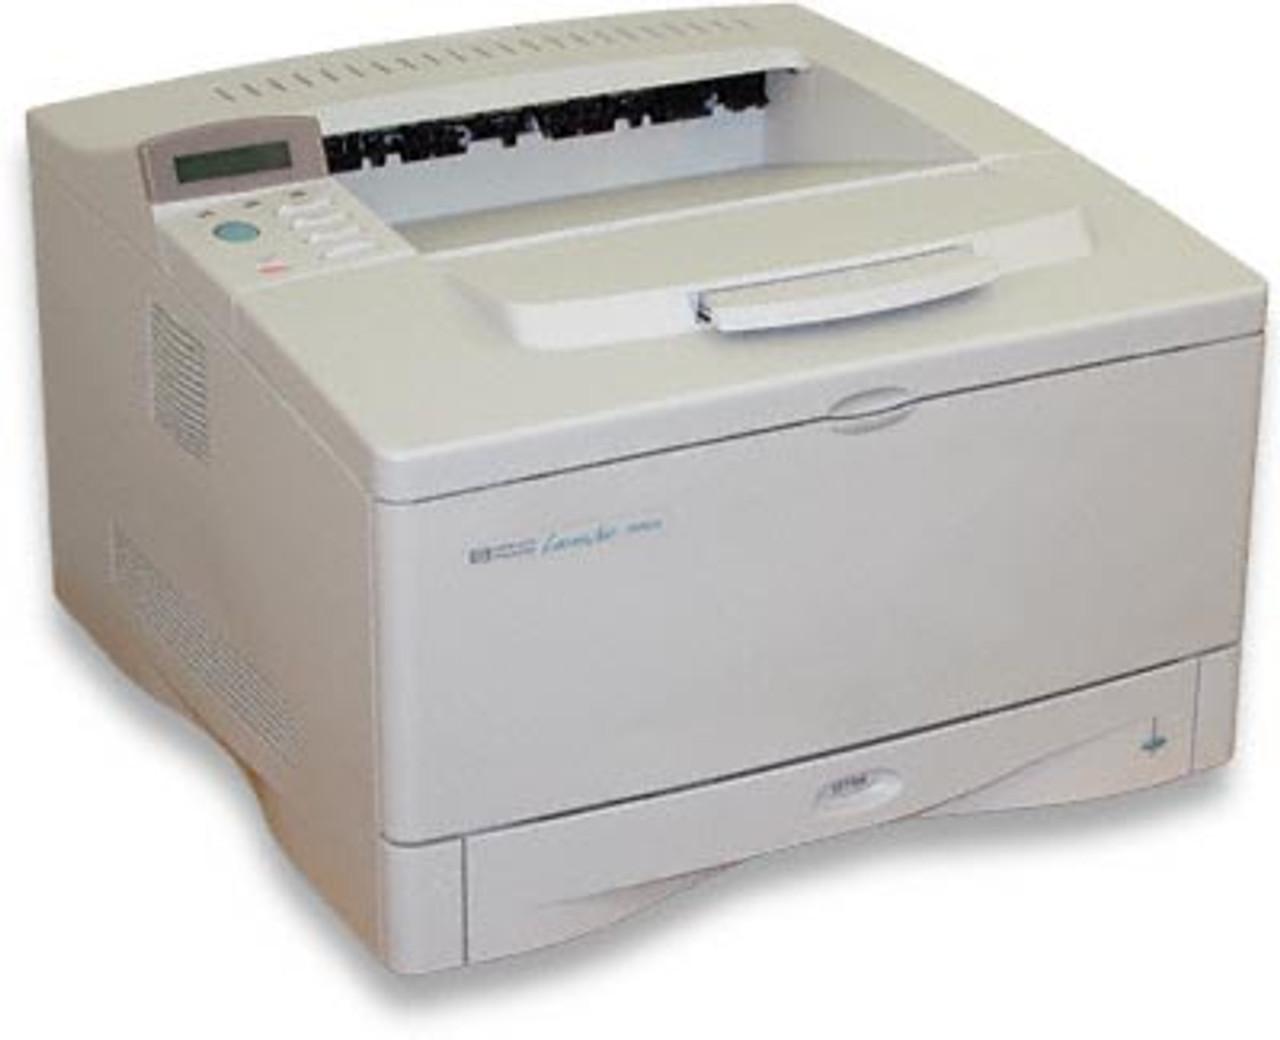 HP LaserJet 5000 - C4110A - HP 11x17 Laser Printer for sale